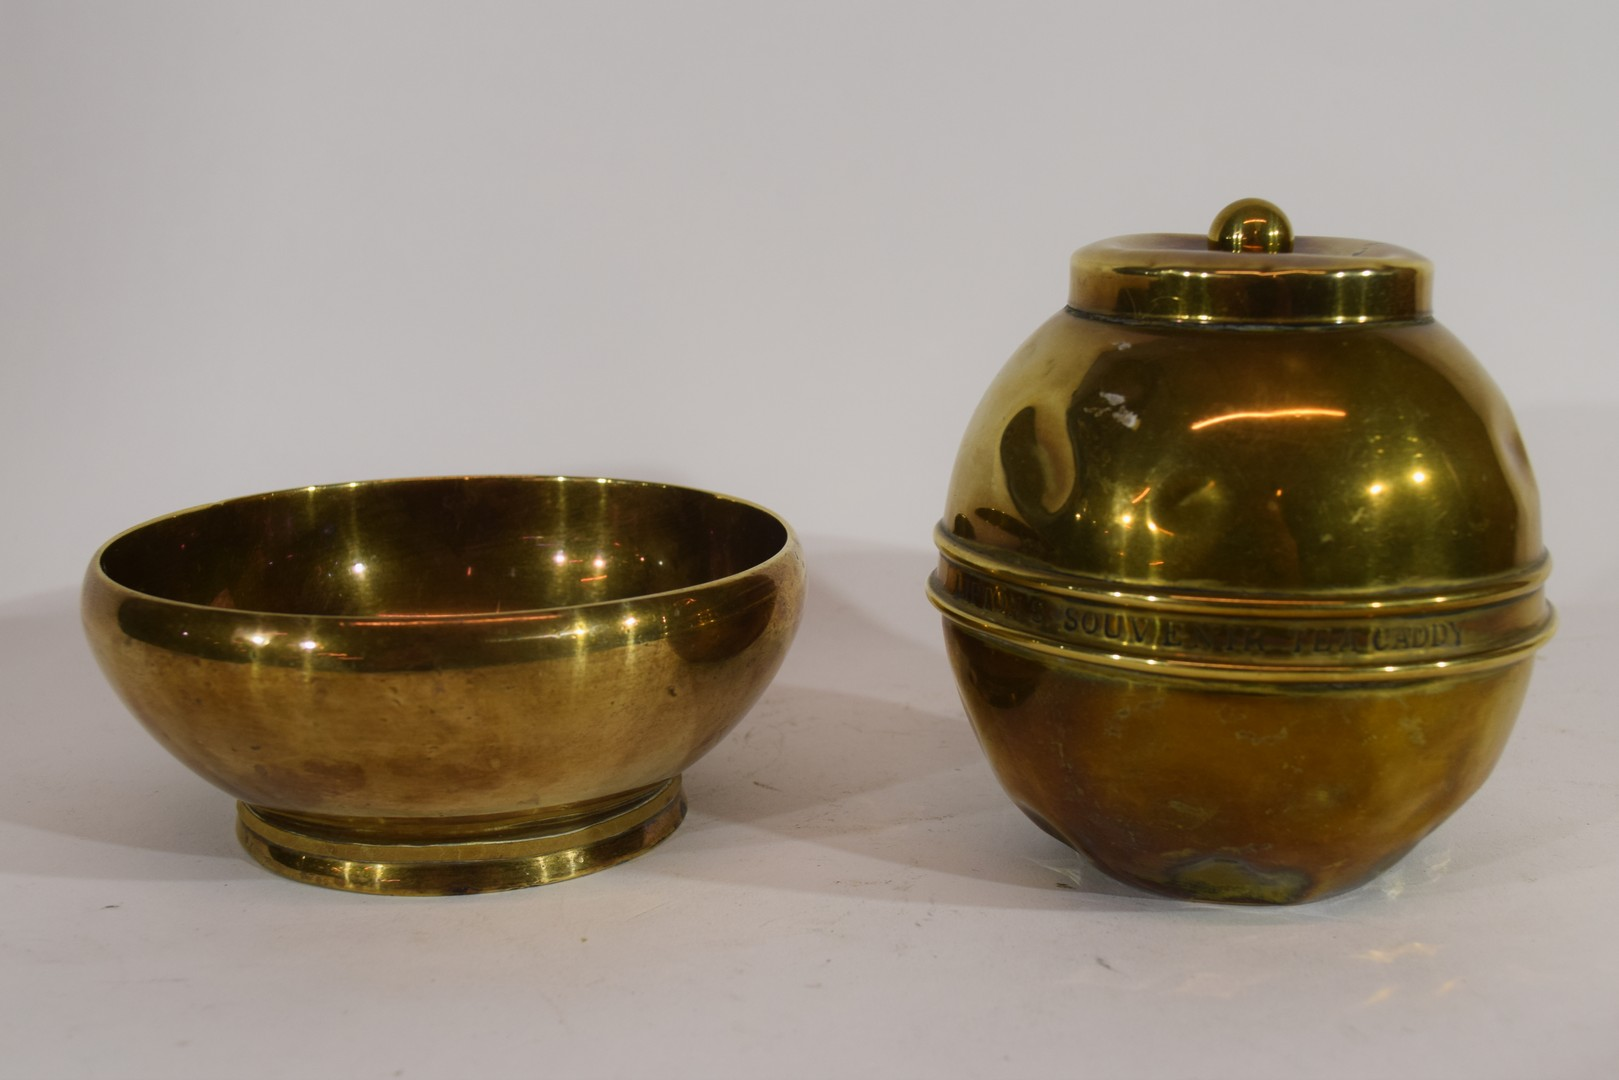 Liptons souvenir tea caddy from The British Empire Exhibition 1924